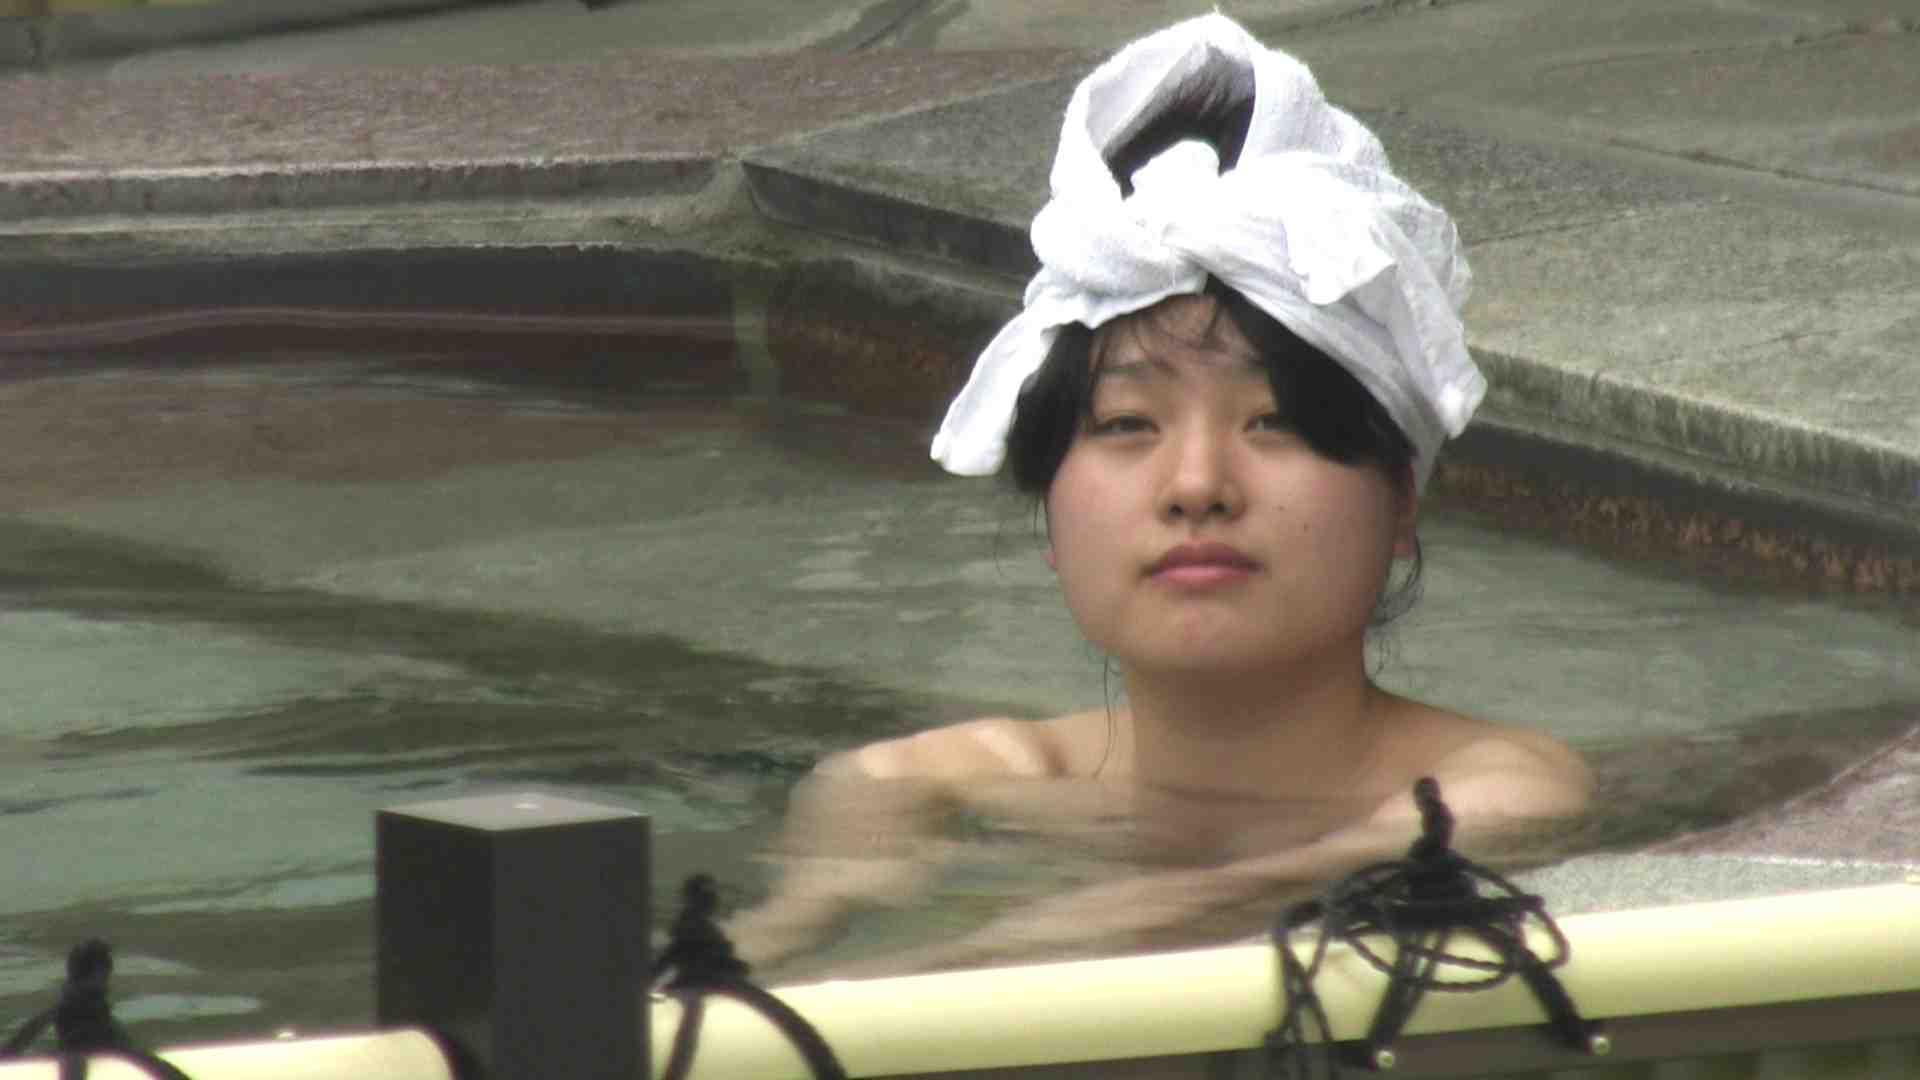 Aquaな露天風呂Vol.185 盗撮   HなOL  102pic 37